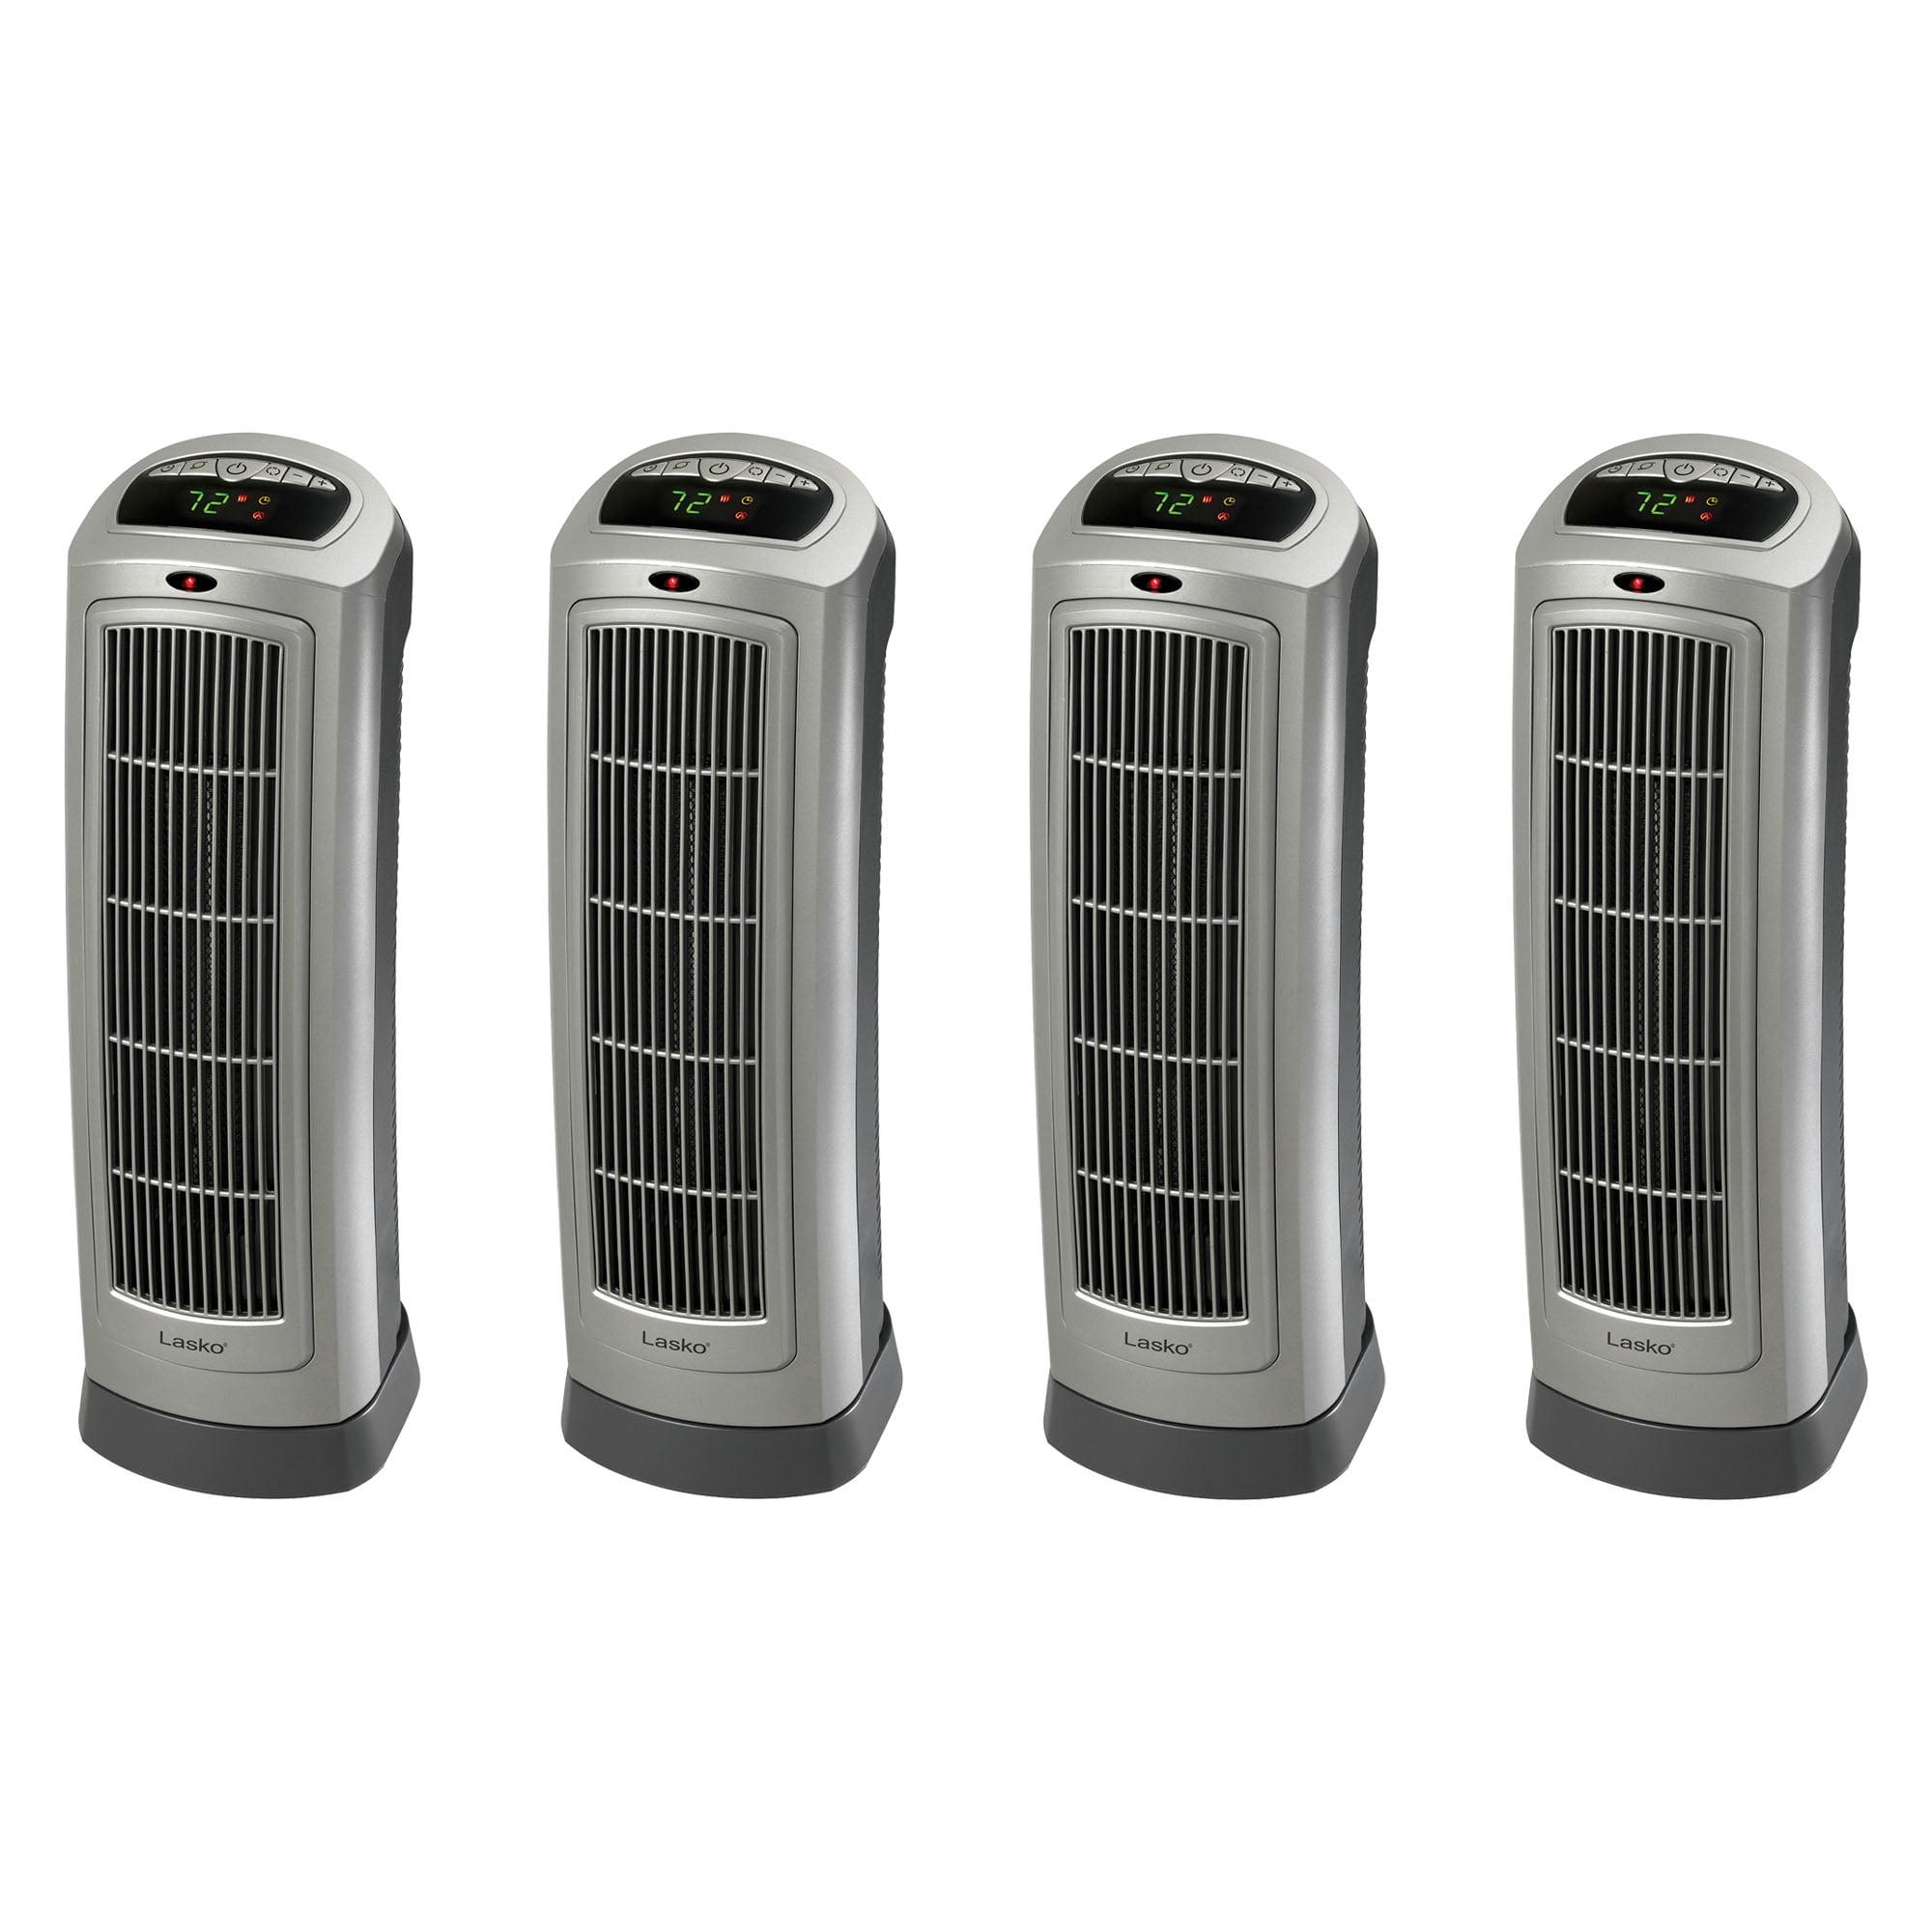 Lasko 1500W Oscillating Ceramic Tower Heater with Digital...